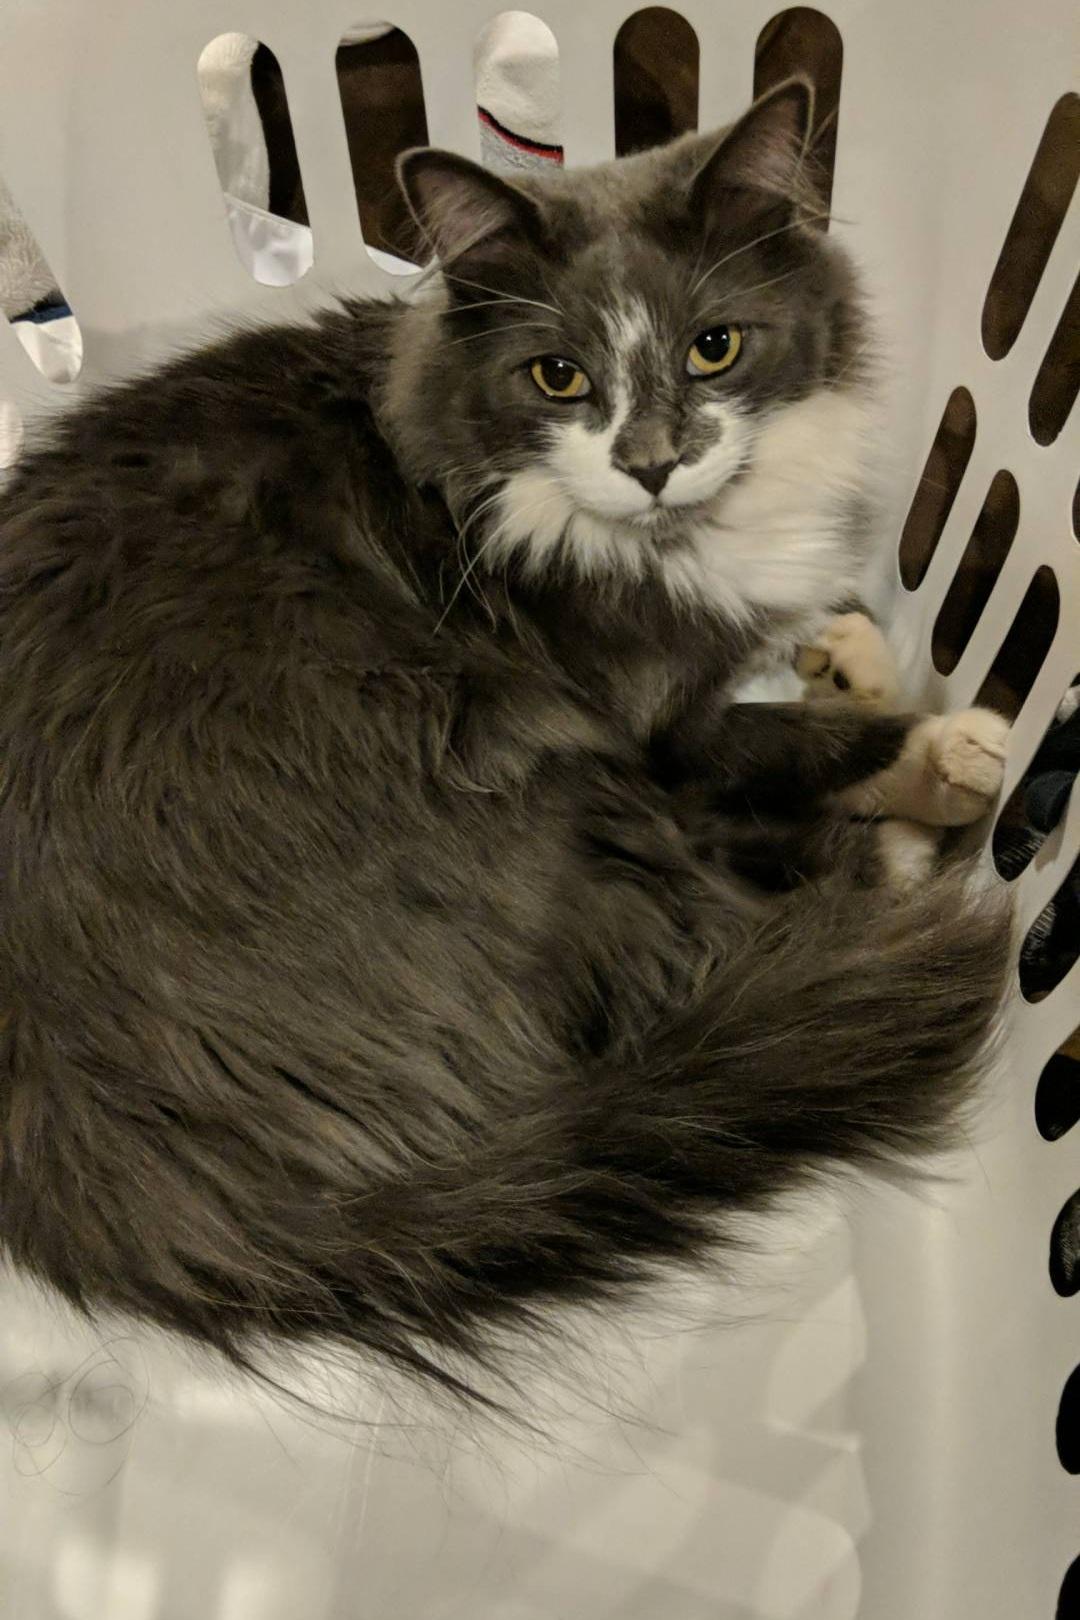 Paulie in a basket